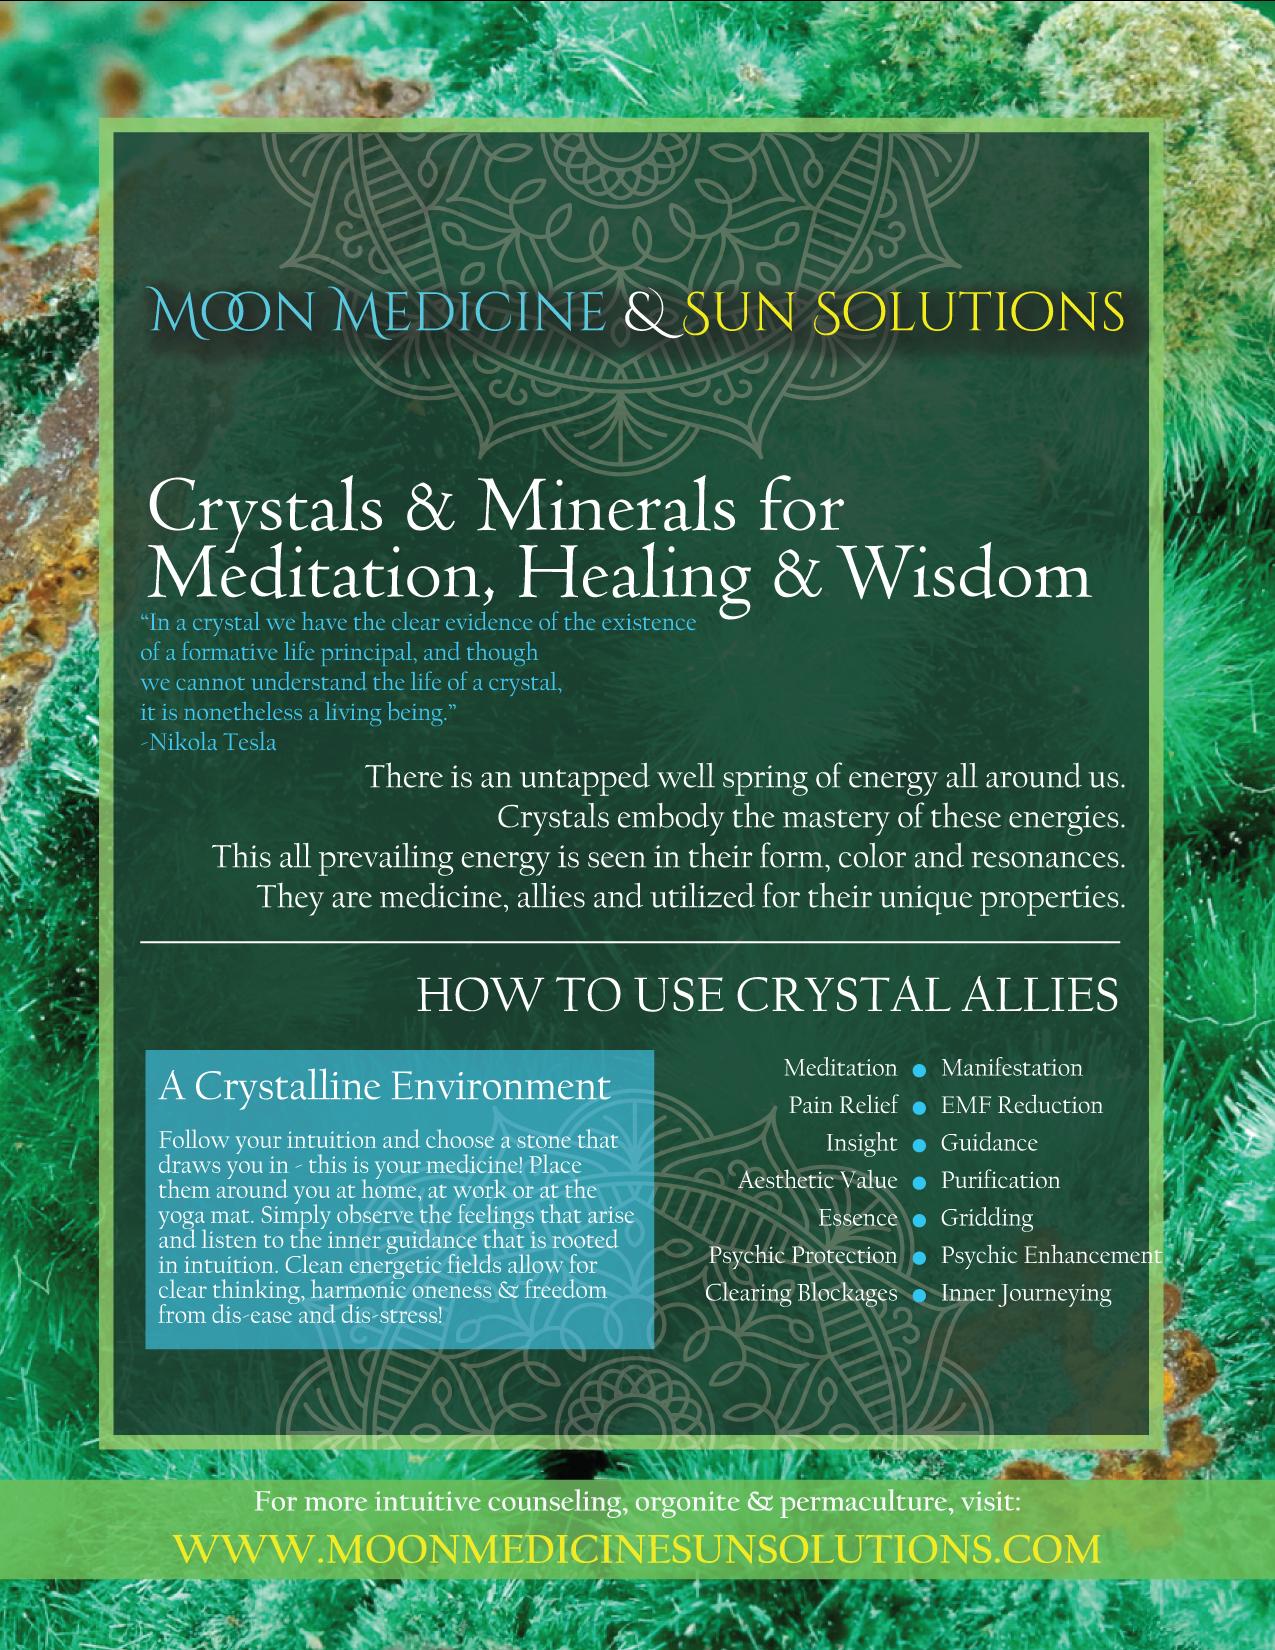 Crystal-poster-moonmedicinesunsolutions.png